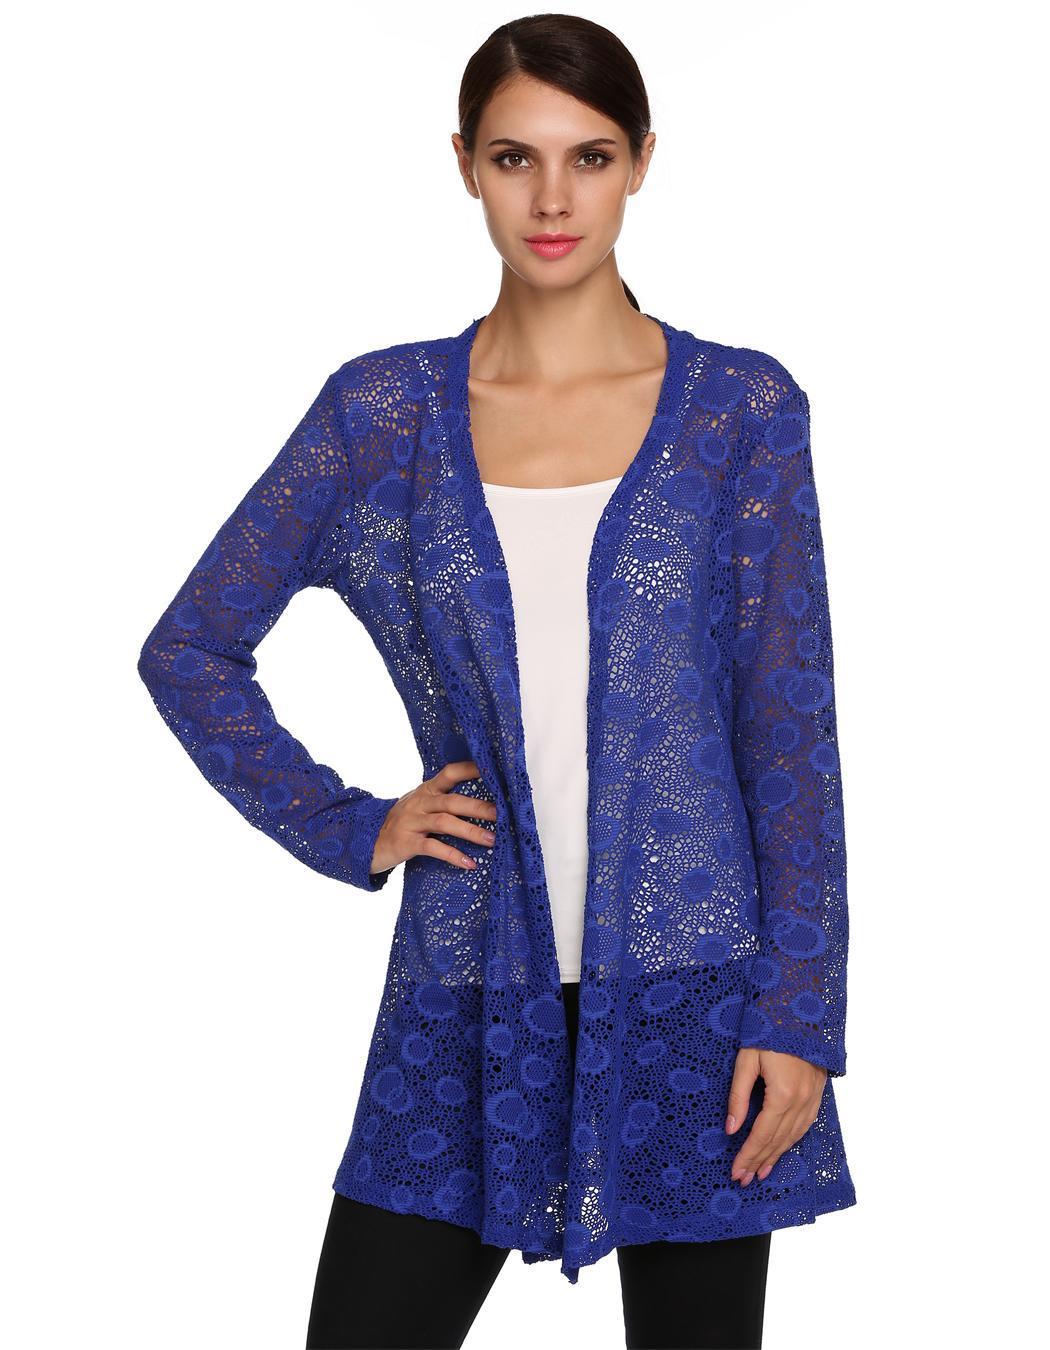 Women Long Sleeve Hollow Out Crochet Long Cardigan Tops 3